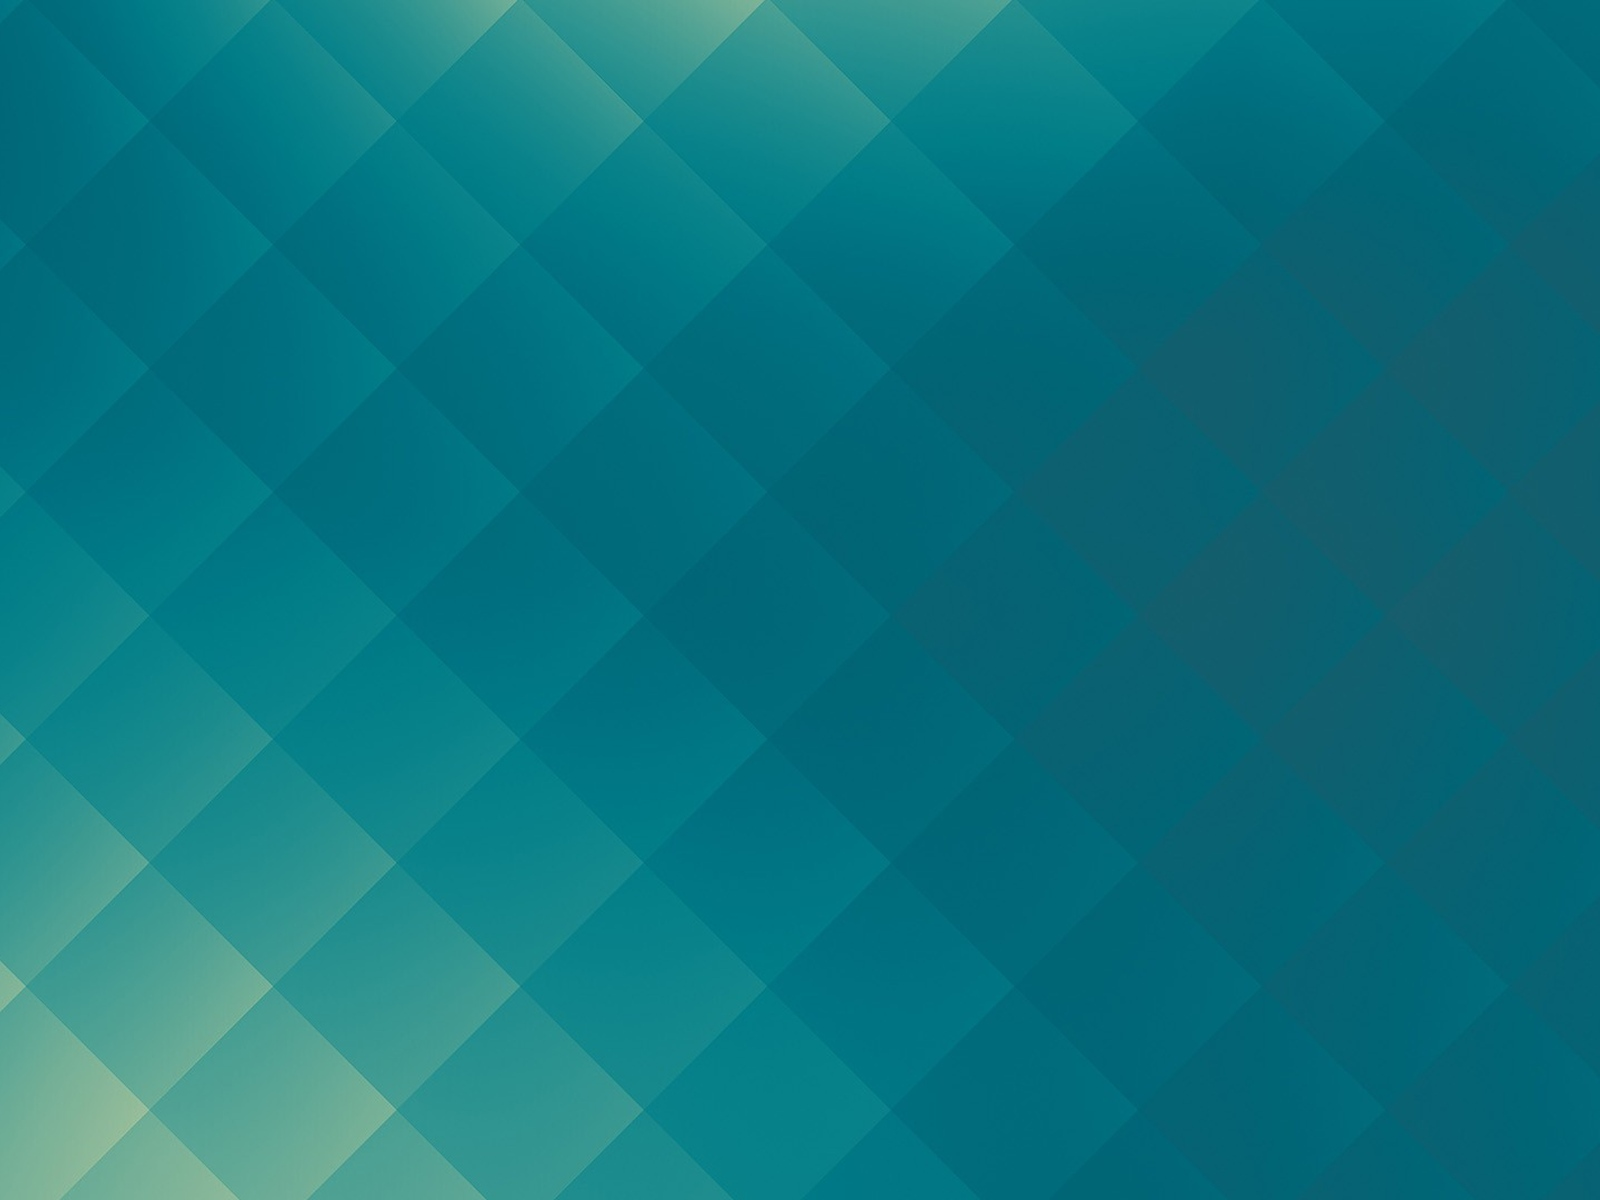 gradient-texture-cubes.jpg